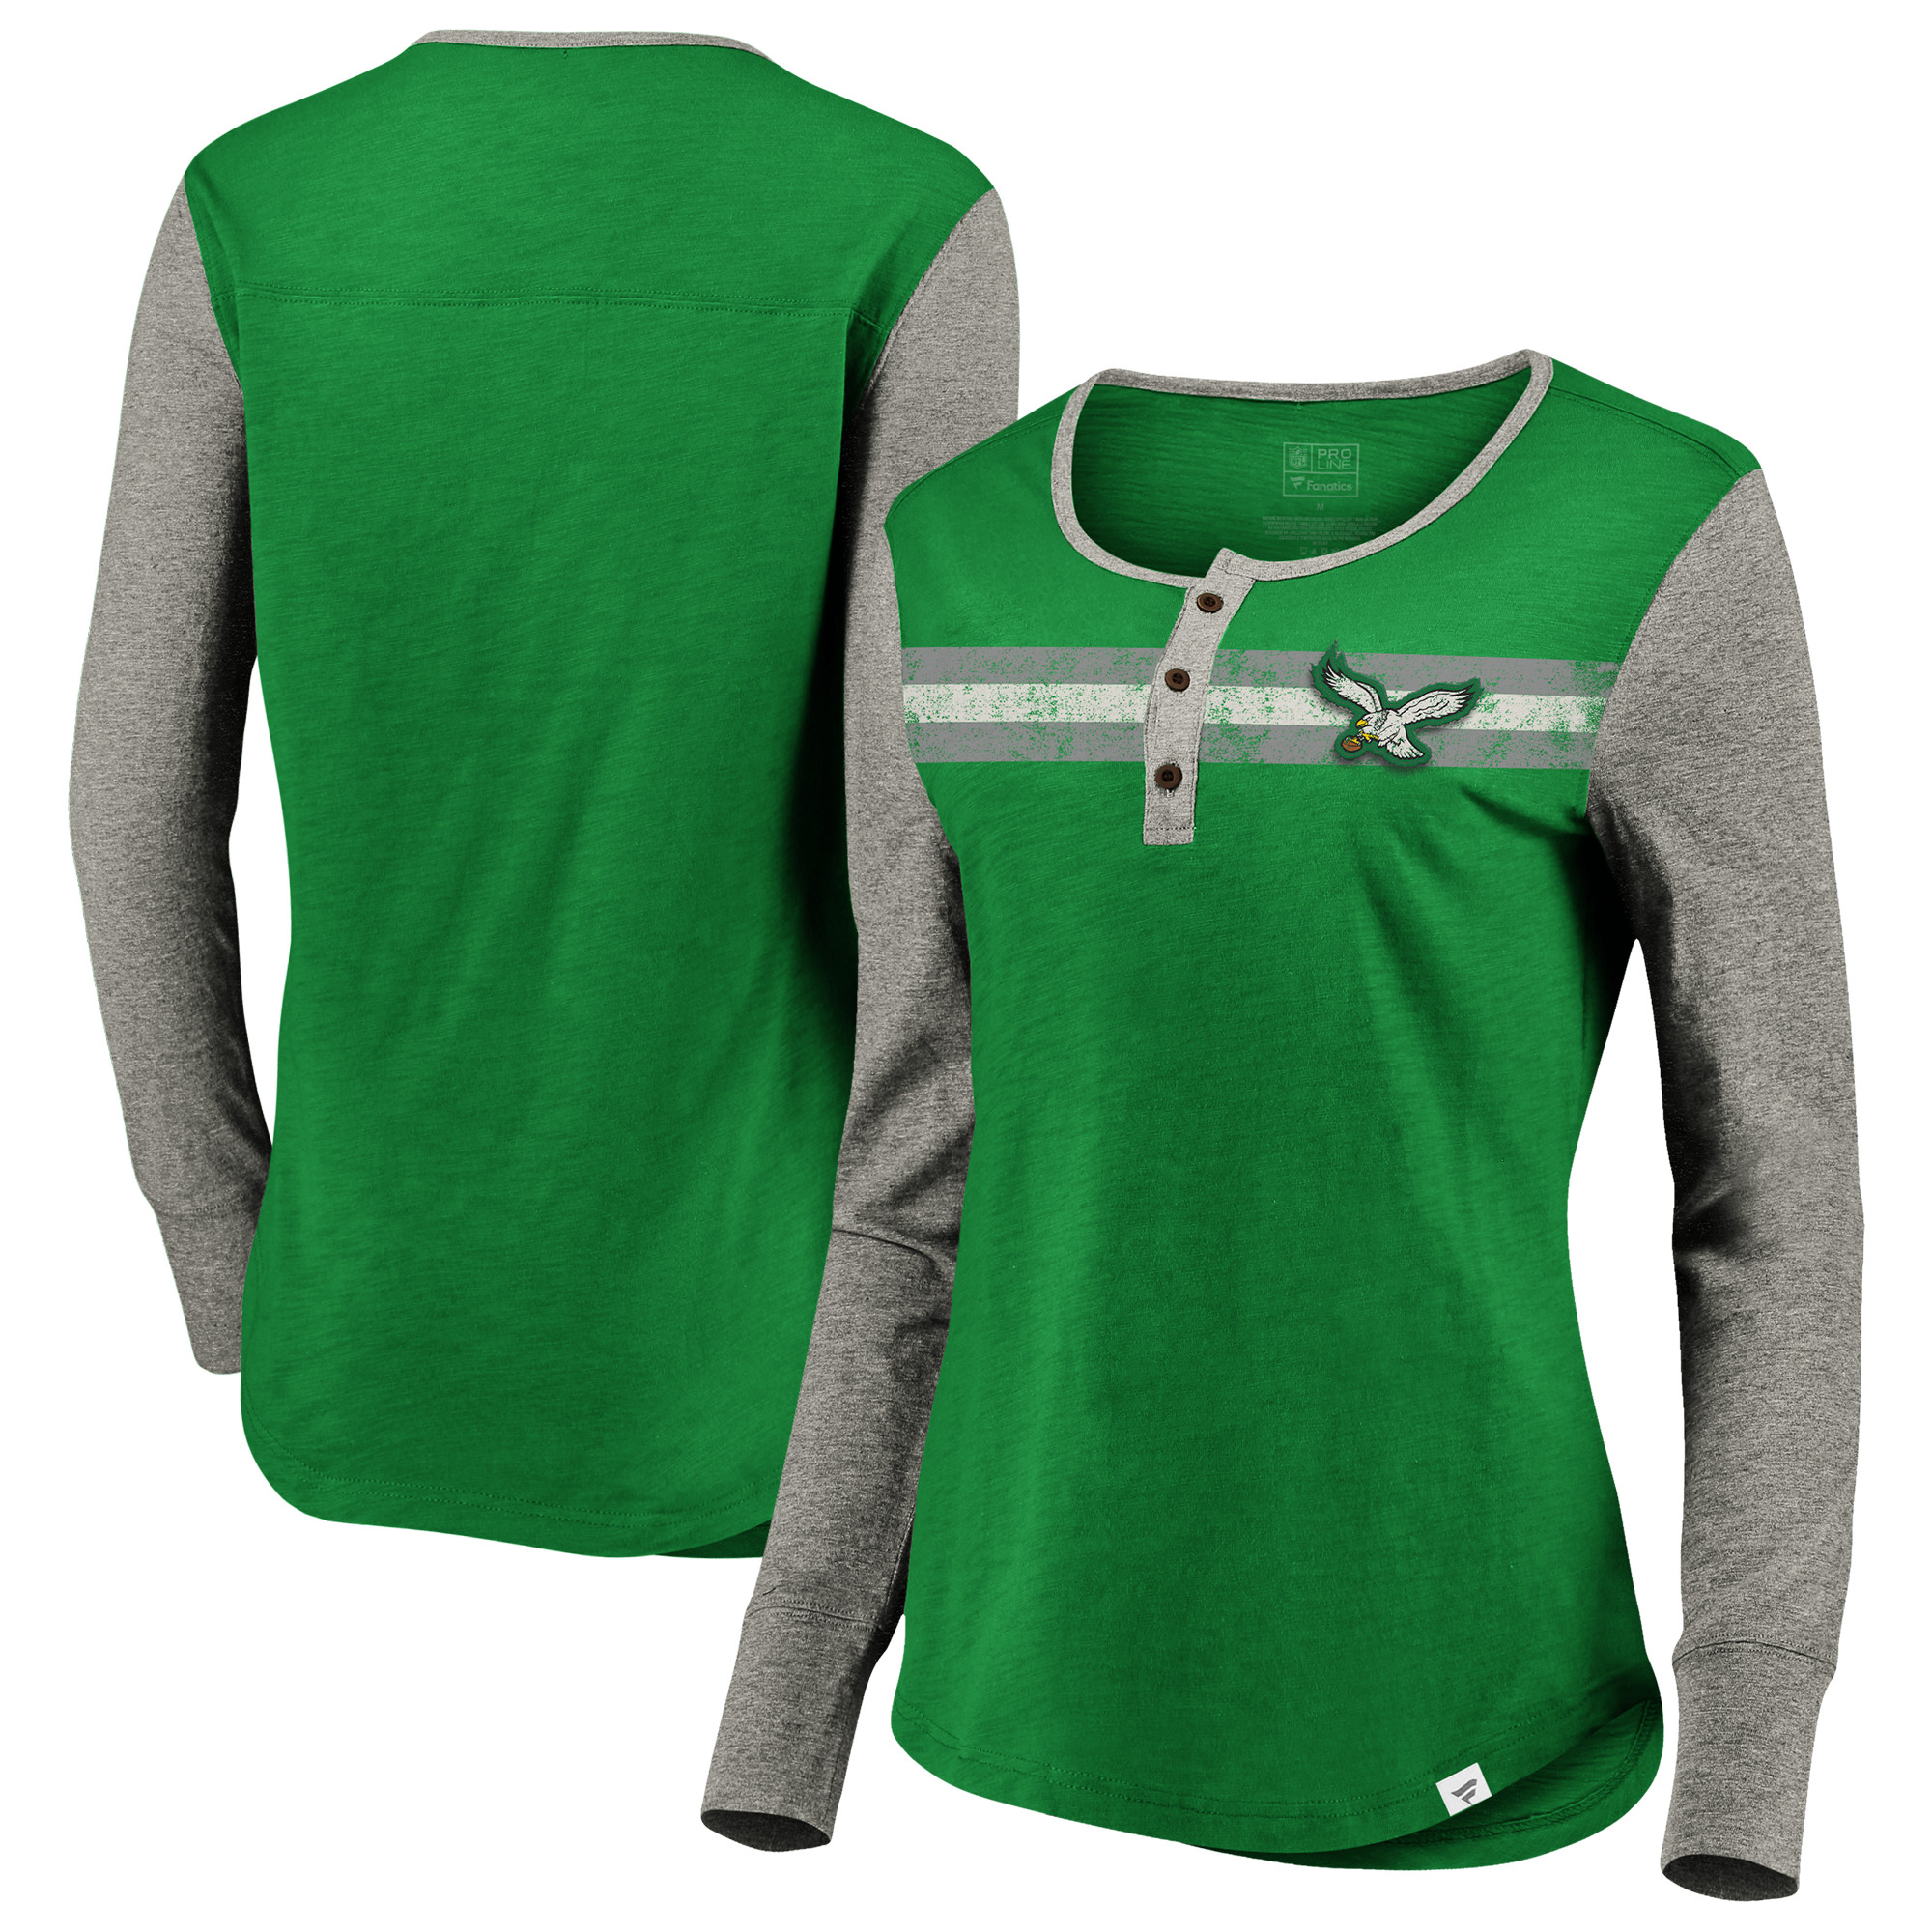 Philadelphia Eagles NFL Pro Line by Fanatics Branded Women's True Classics Retro Stripe Henley T-Shirt - Kelly Green/Heathered Gray